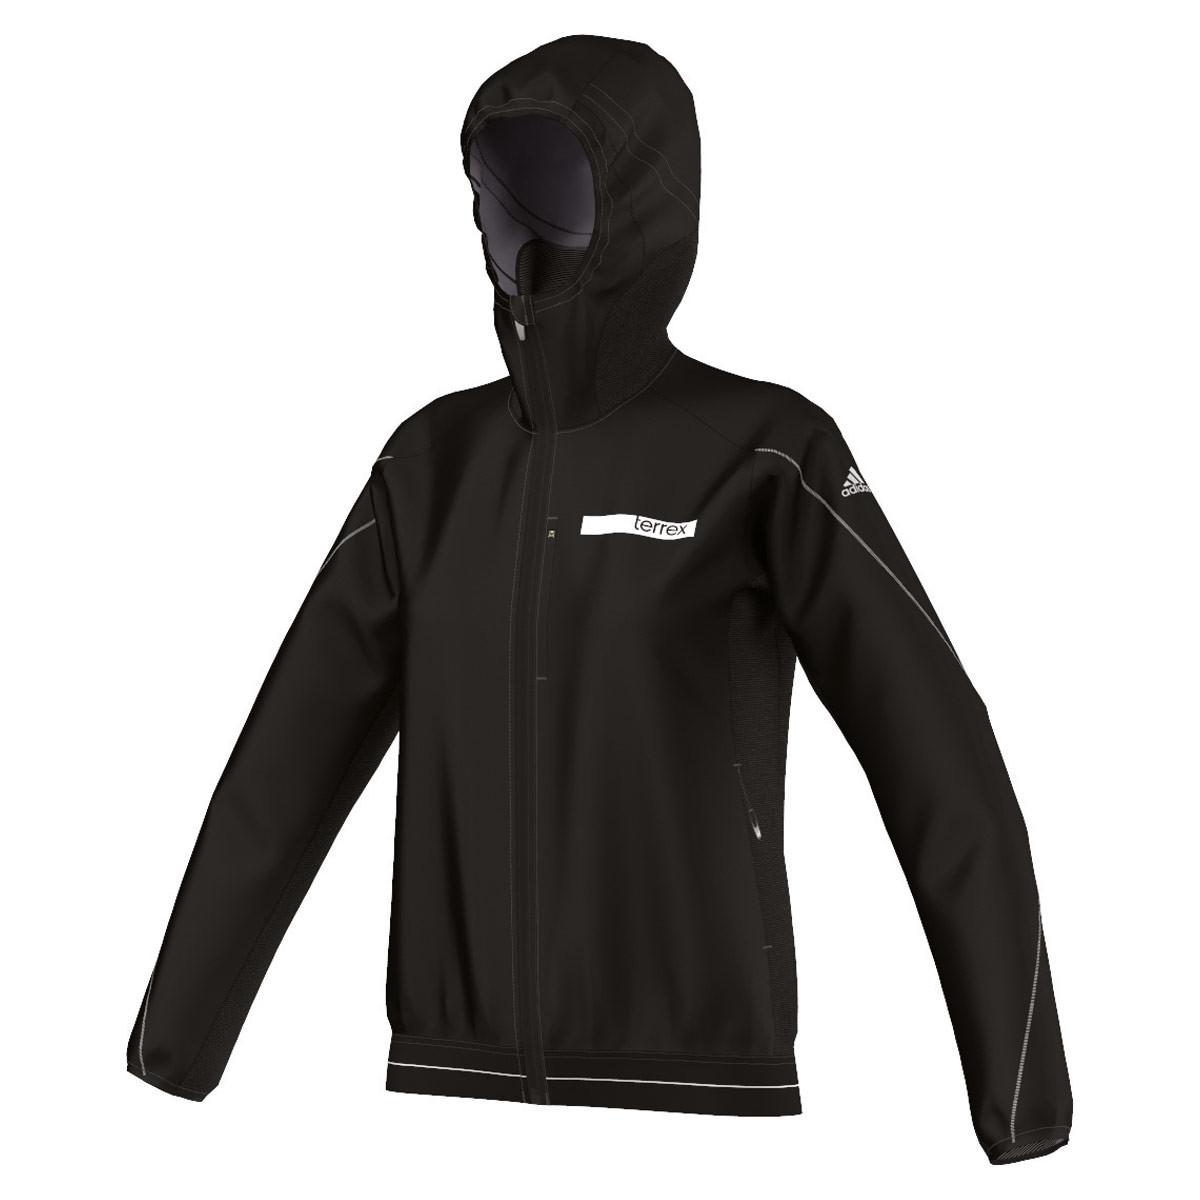 39eab12a5848 adidas Terrex Agravic Hybrid Softshell Jacket - Running jackets for Women -  Black   21RUN